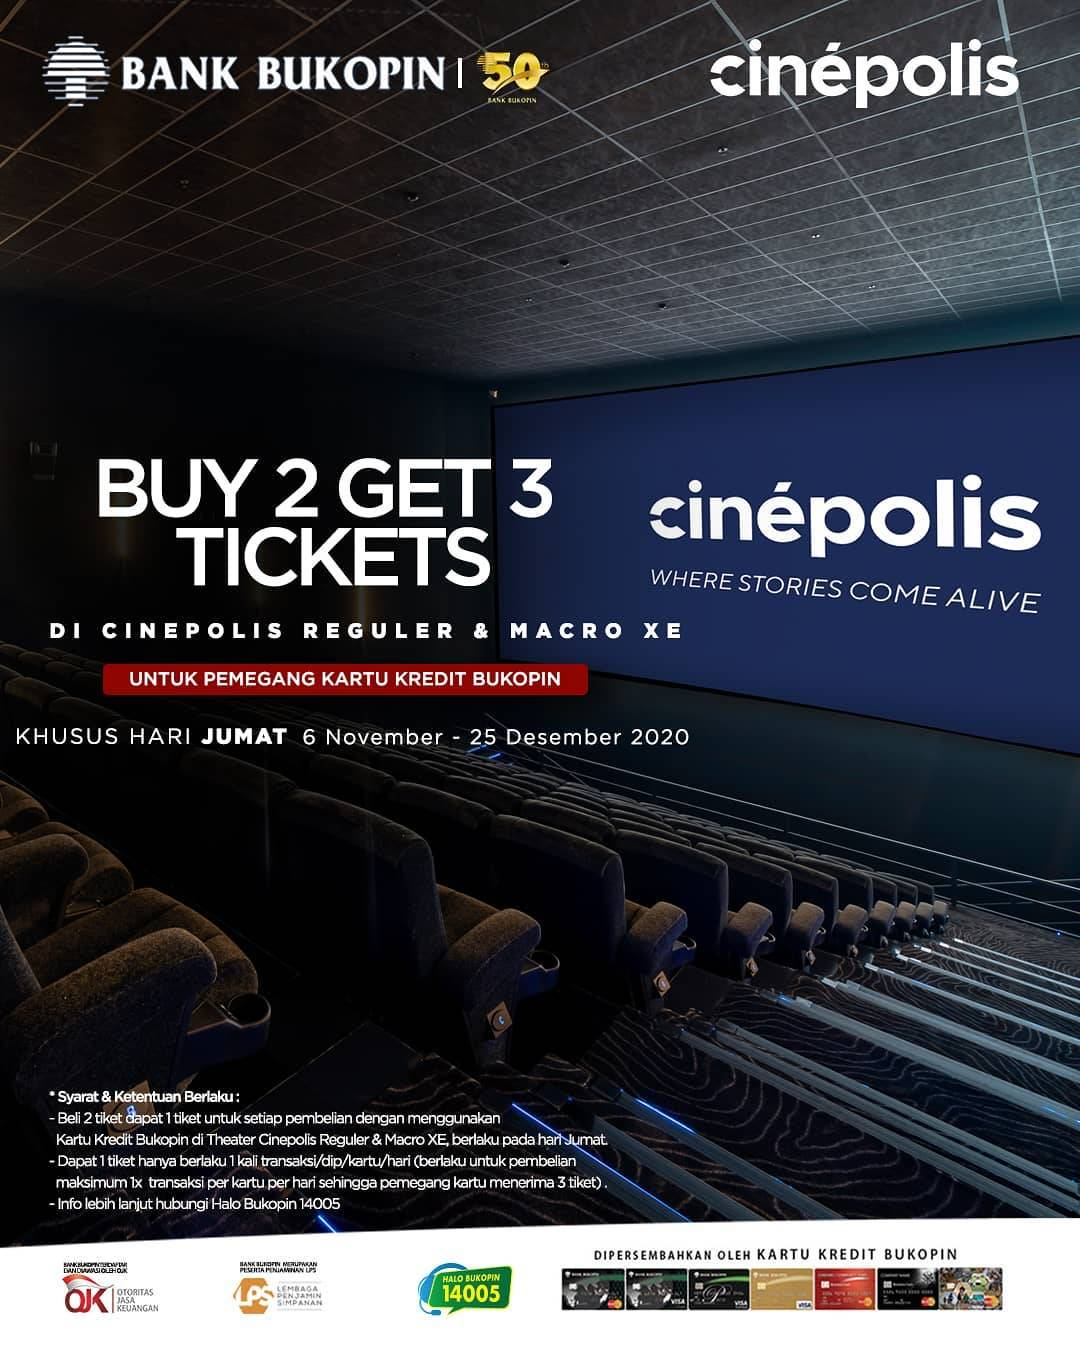 Diskon Cinepolis Buy 2 Get 3 Free Tickets With Bukopin Credit Card